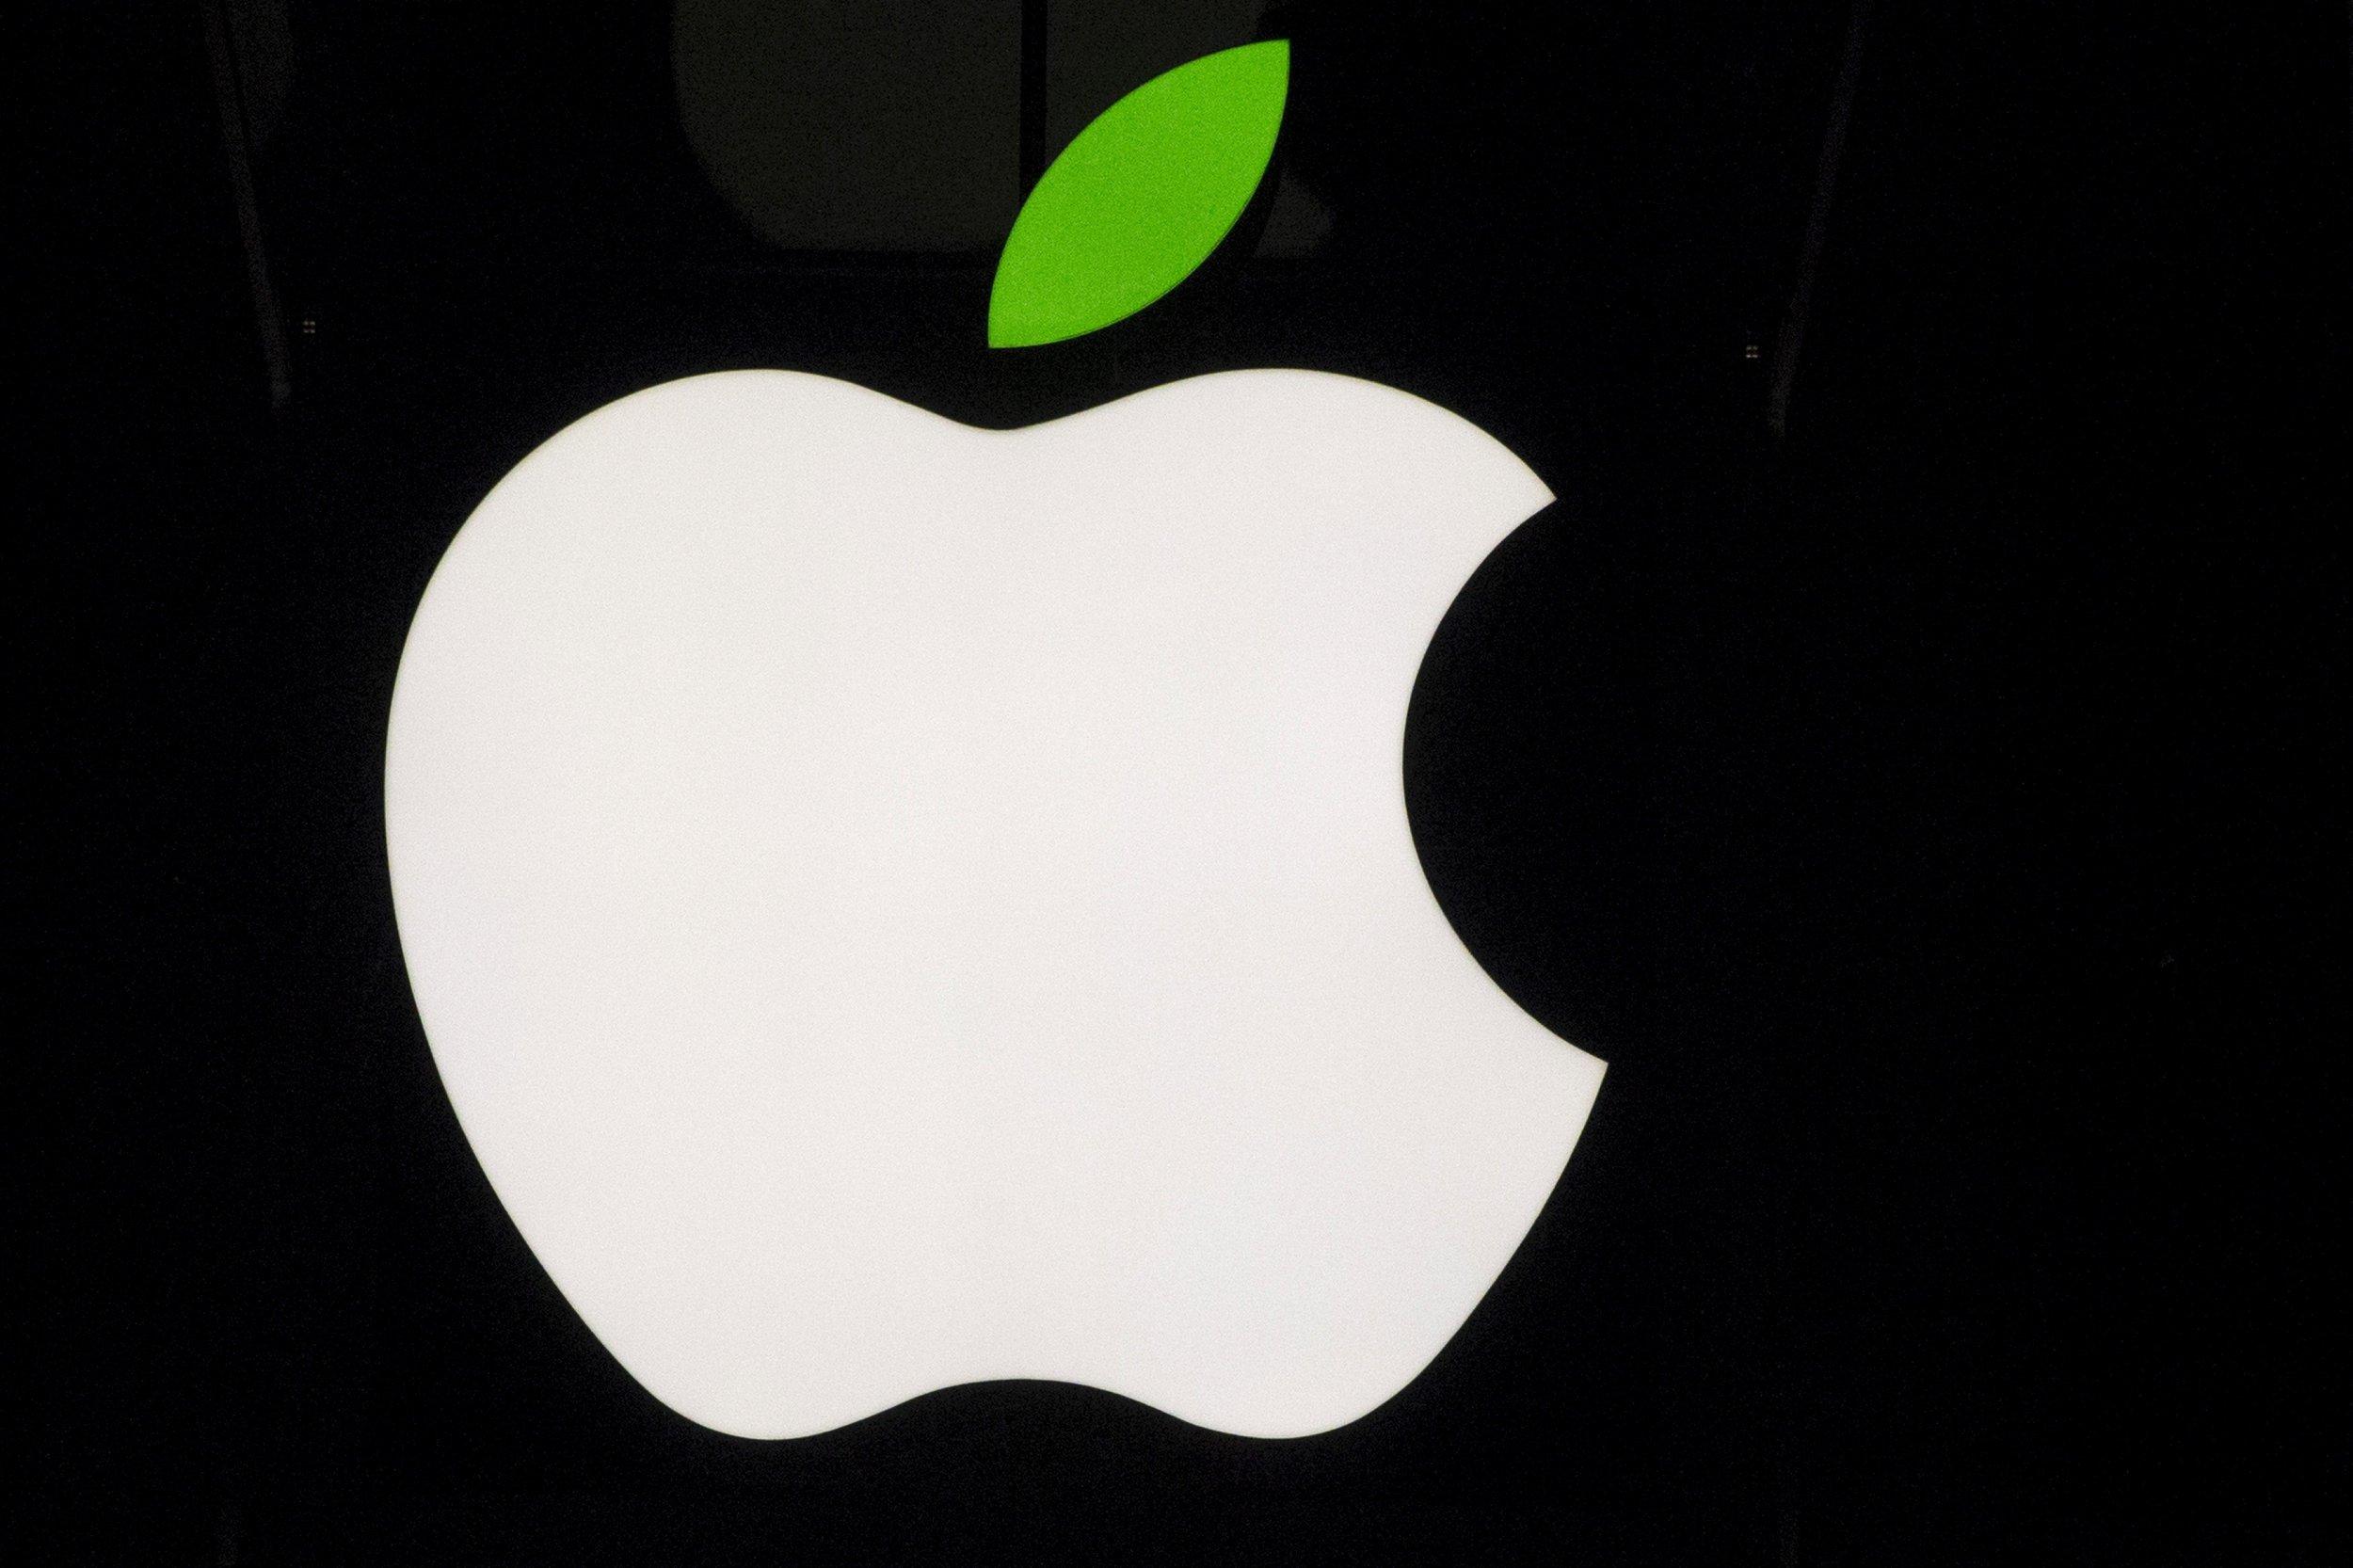 apple iphone 5se launch date